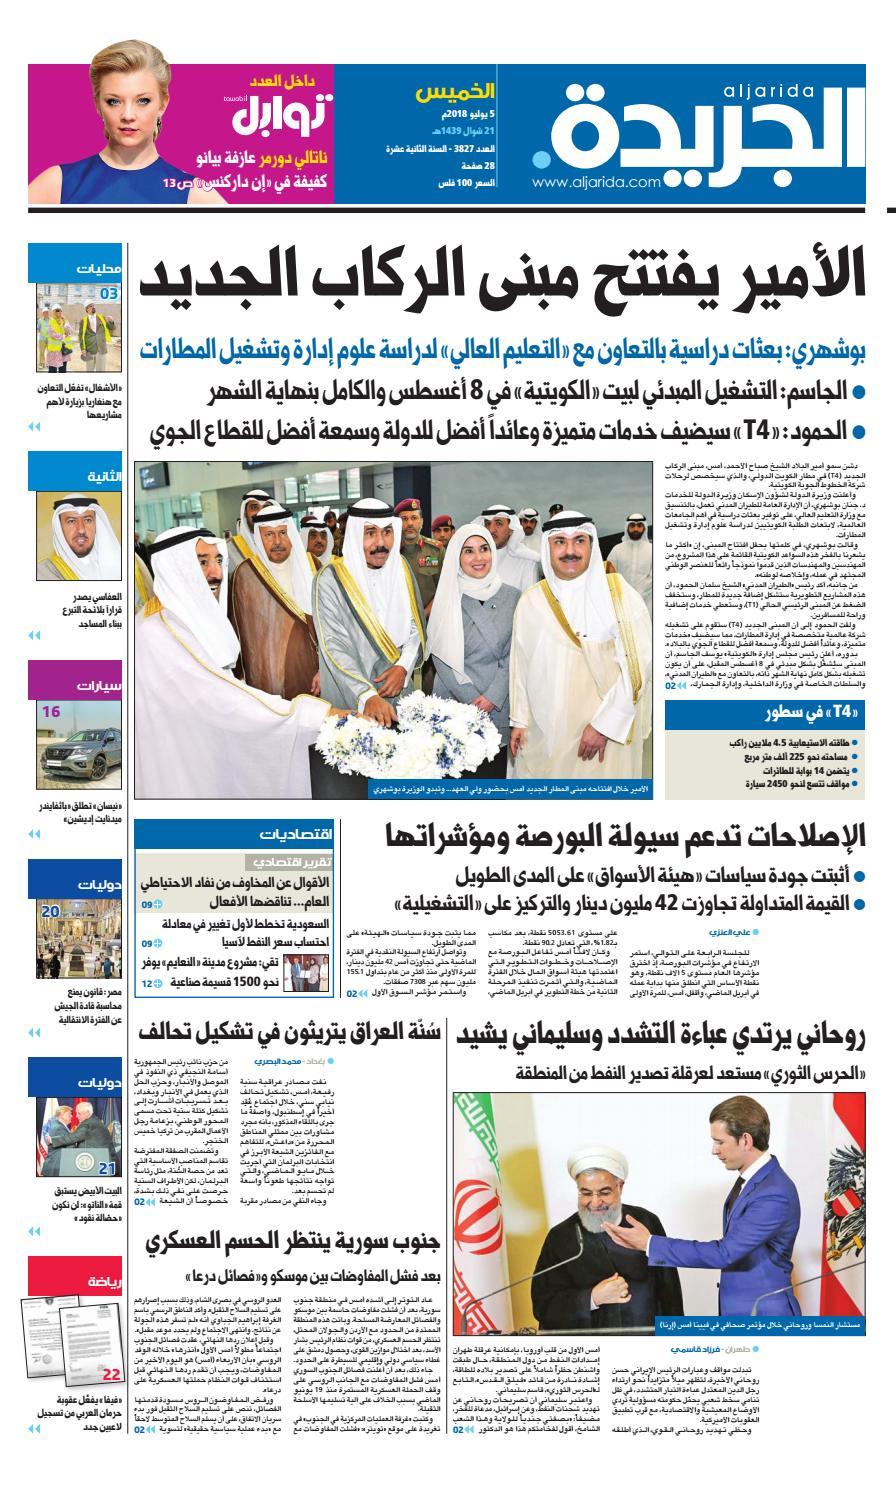 fedff8453 عدد الجريدة الخميس 5 يوليو 2018 by Aljarida Newspaper - issuu